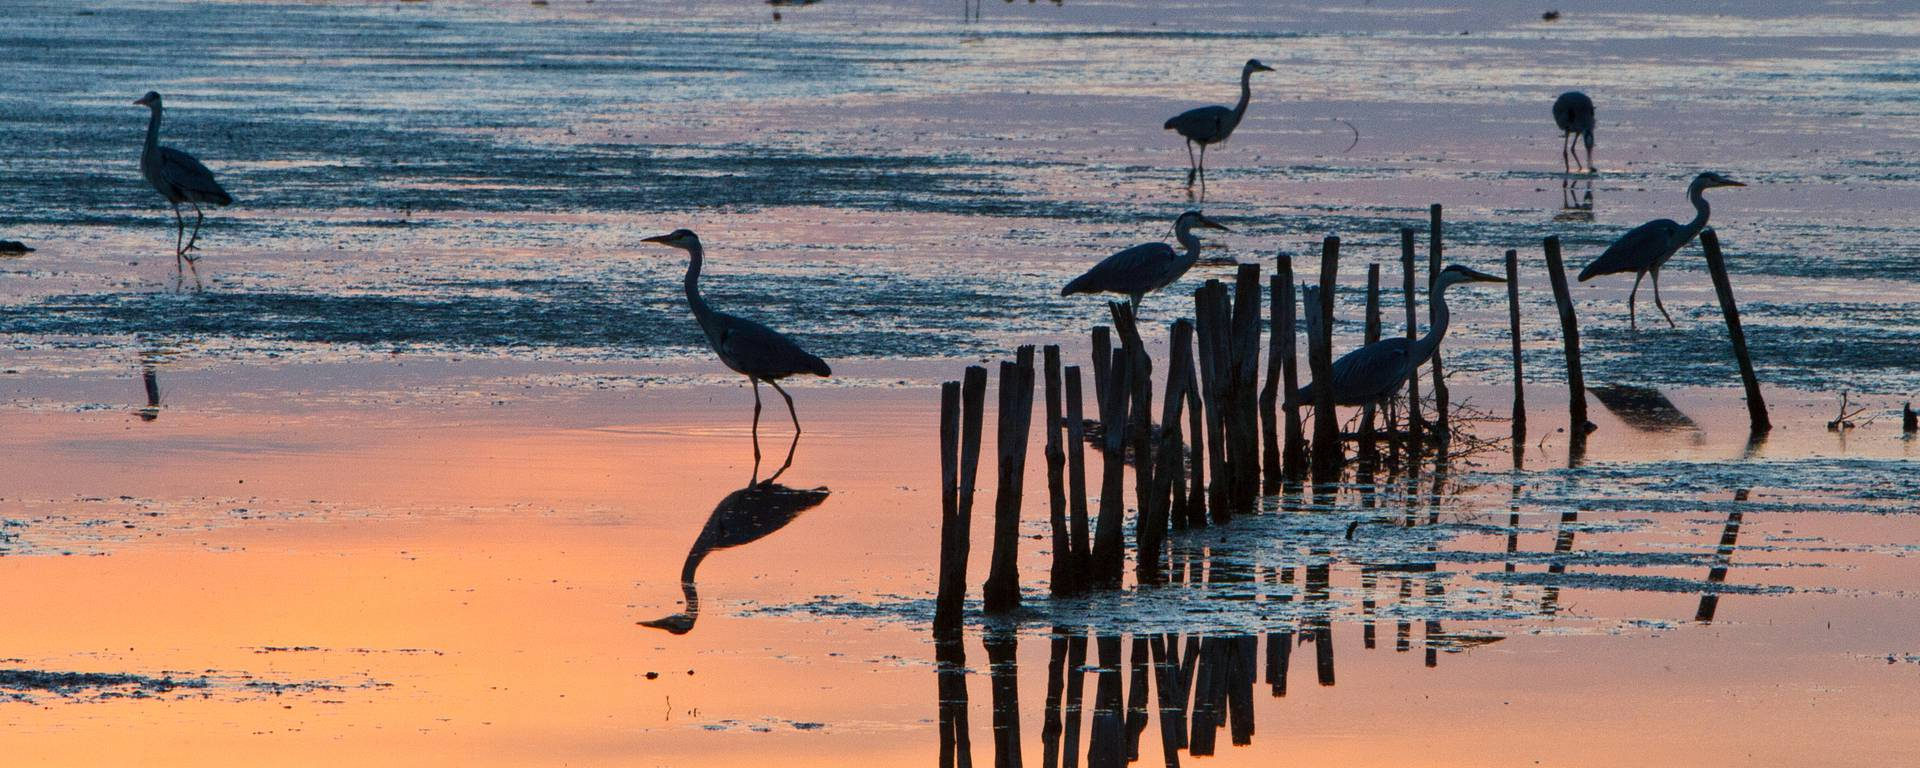 Birds in Portes-en-Ré by François Blanchard